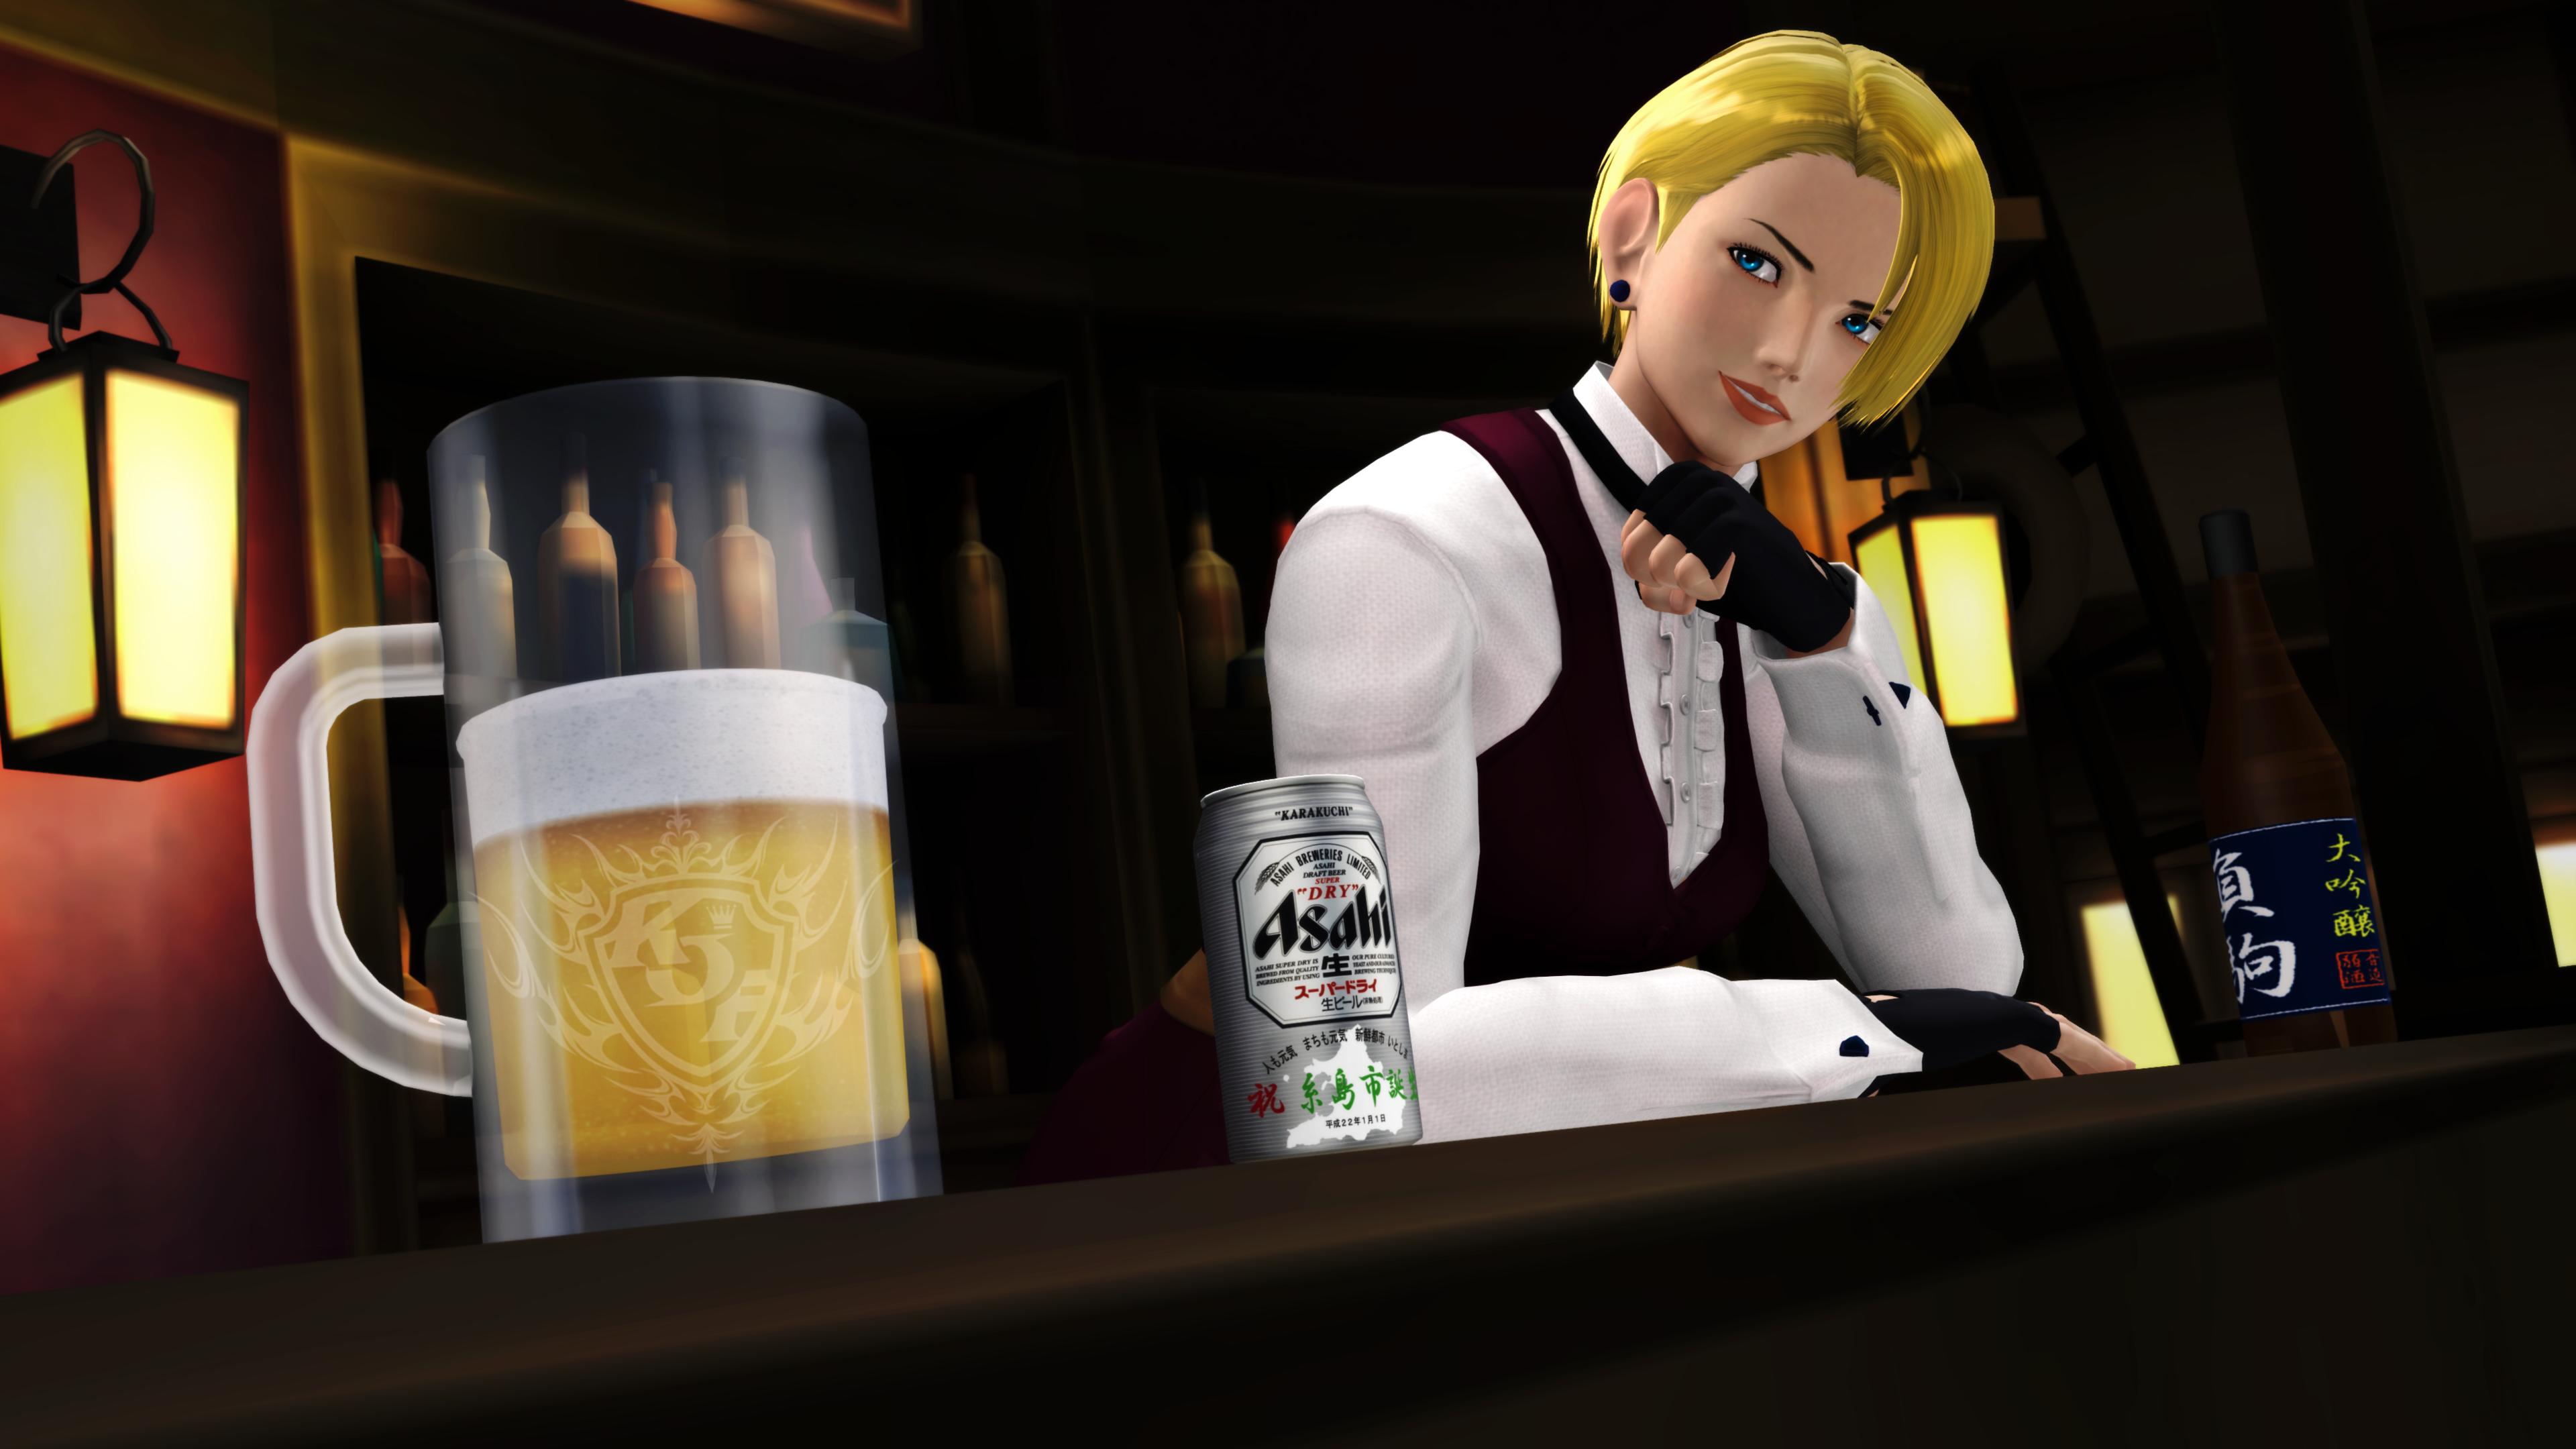 drink responsibly wallpaper - photo #9